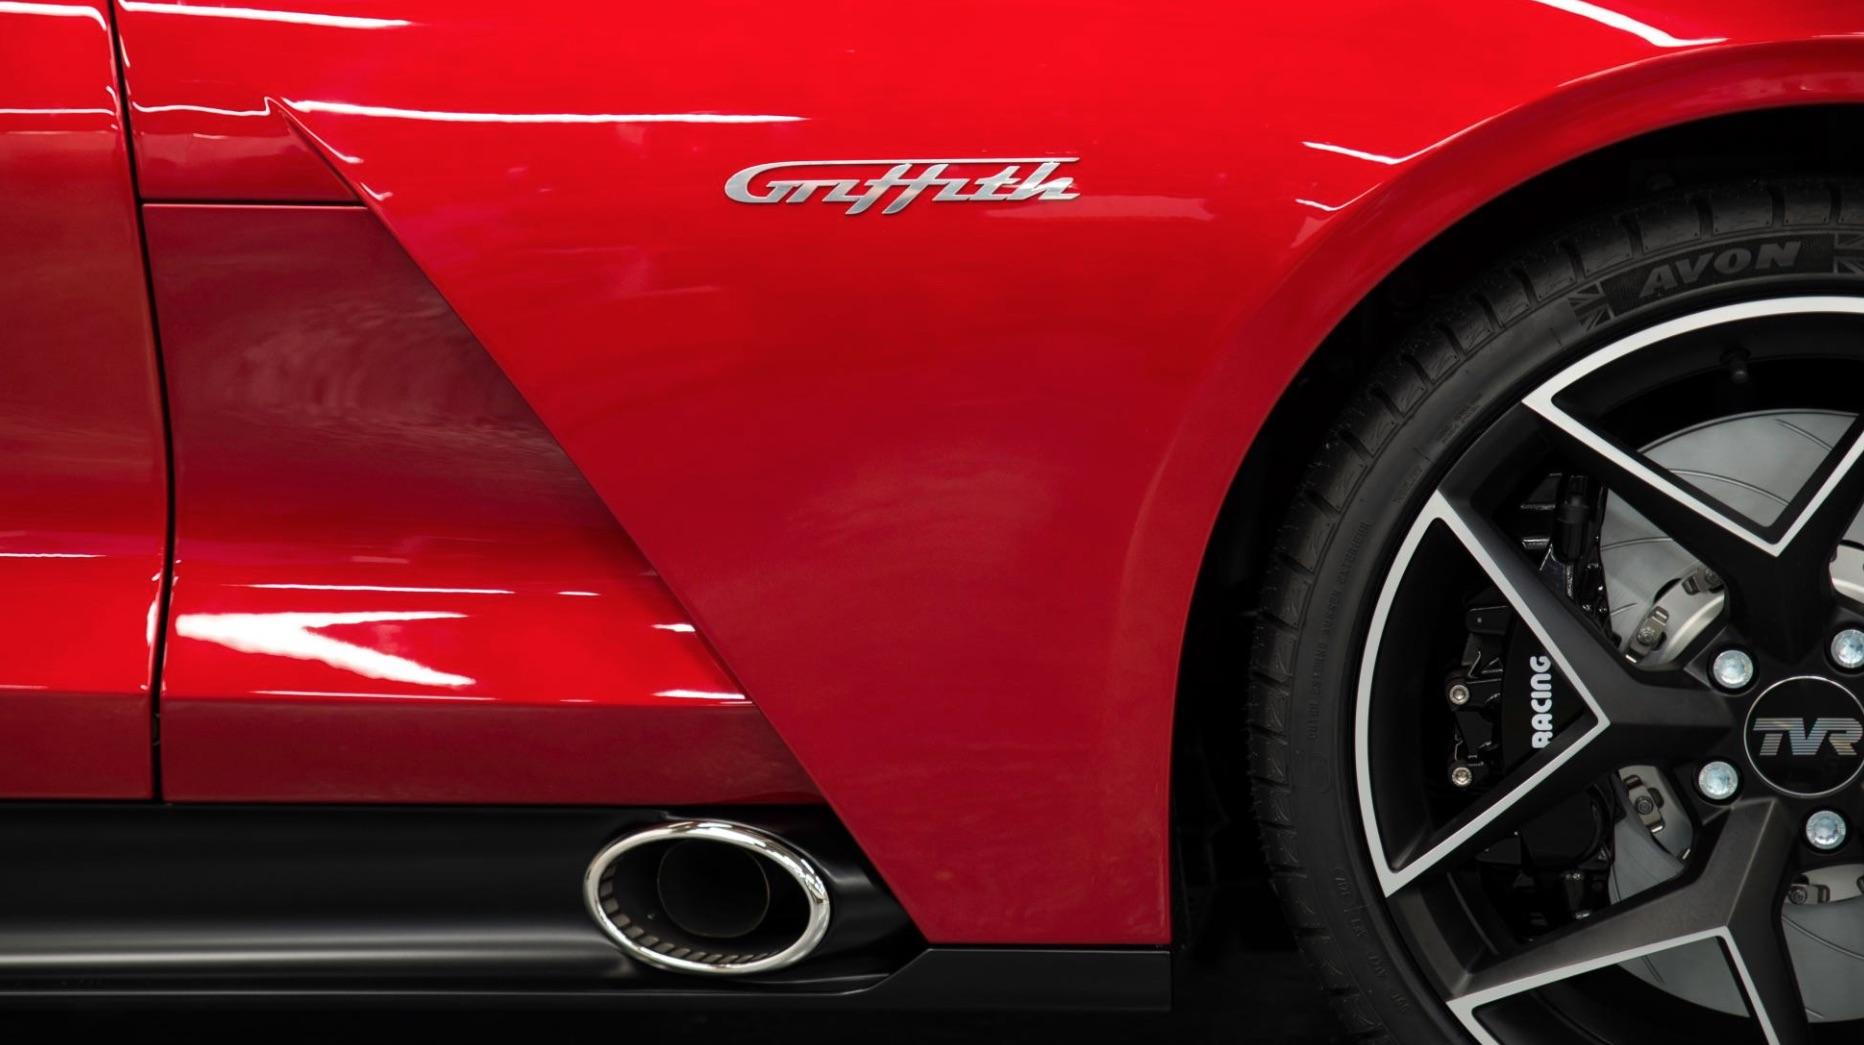 Tvr r tillbaka med en ny griffith motorworld for Griffith motors home pa